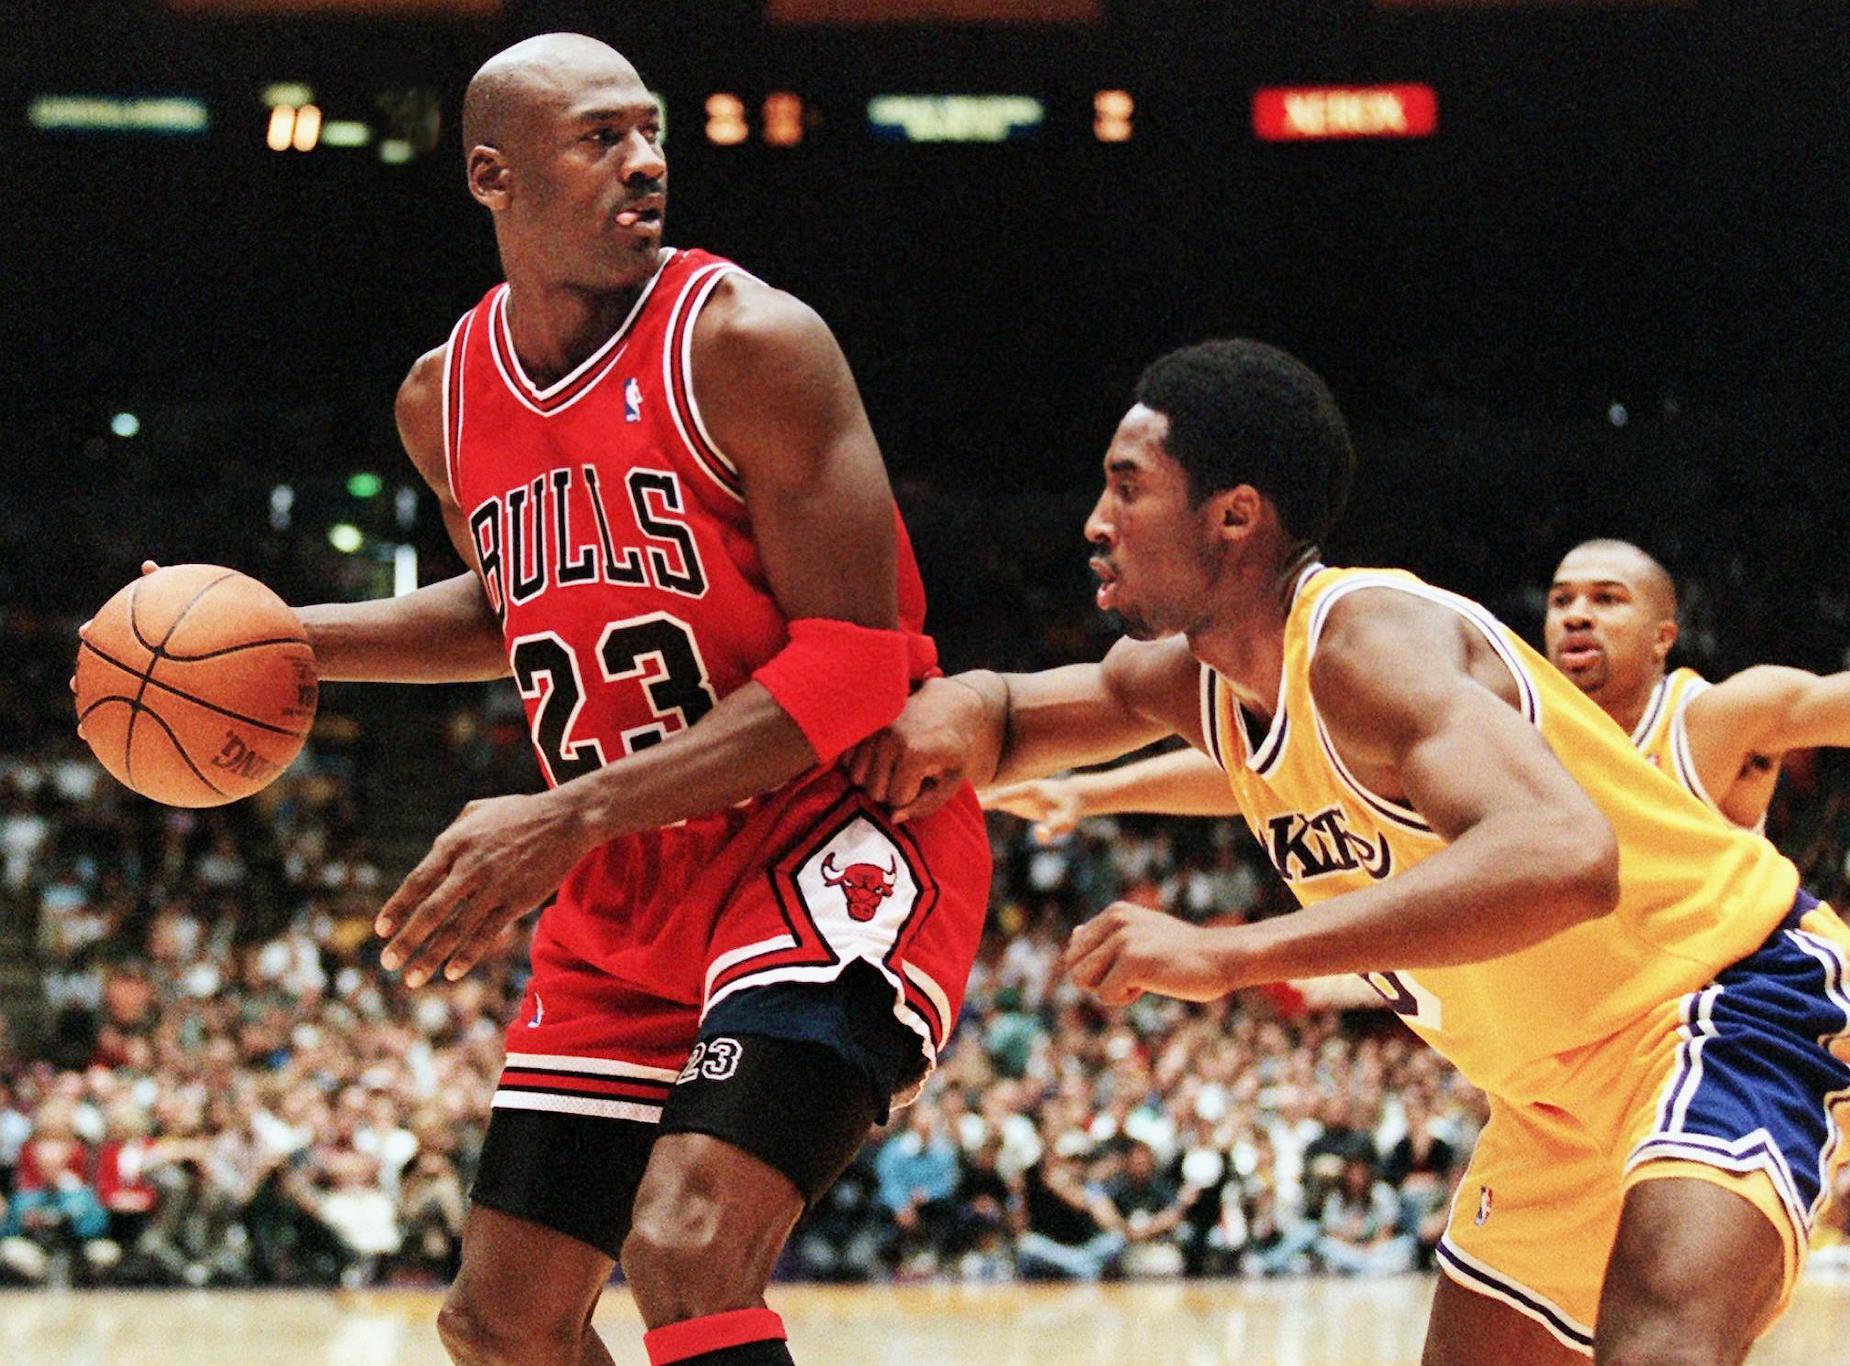 Kobe Bryant Followed Michael Jordan's Footsteps on Both the Dance Floor and the Basketball Court